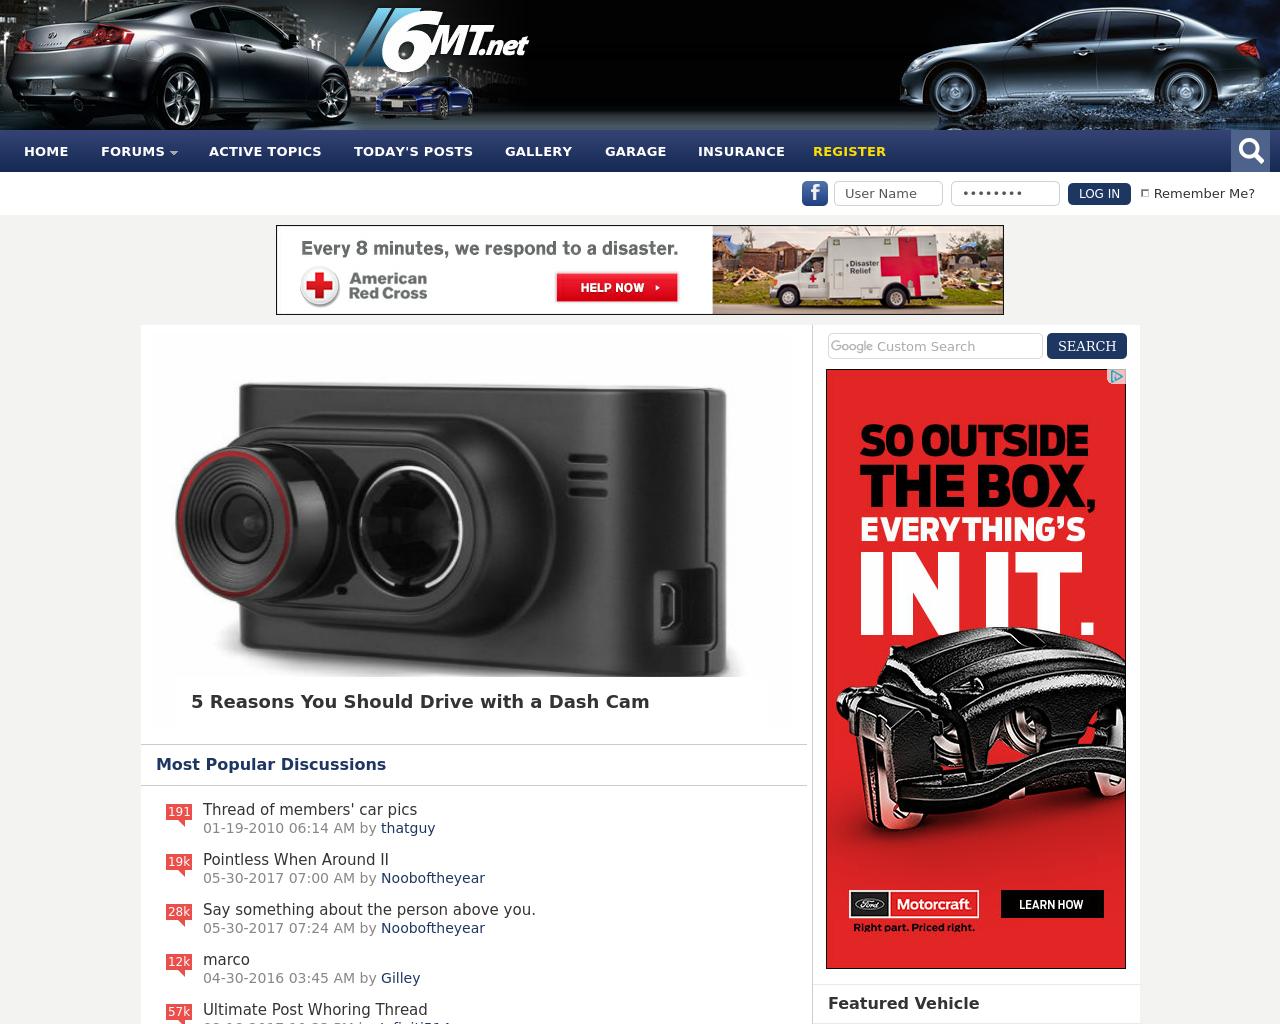 6MT.net-Infiniti-G35/G37/GTR-Advertising-Reviews-Pricing